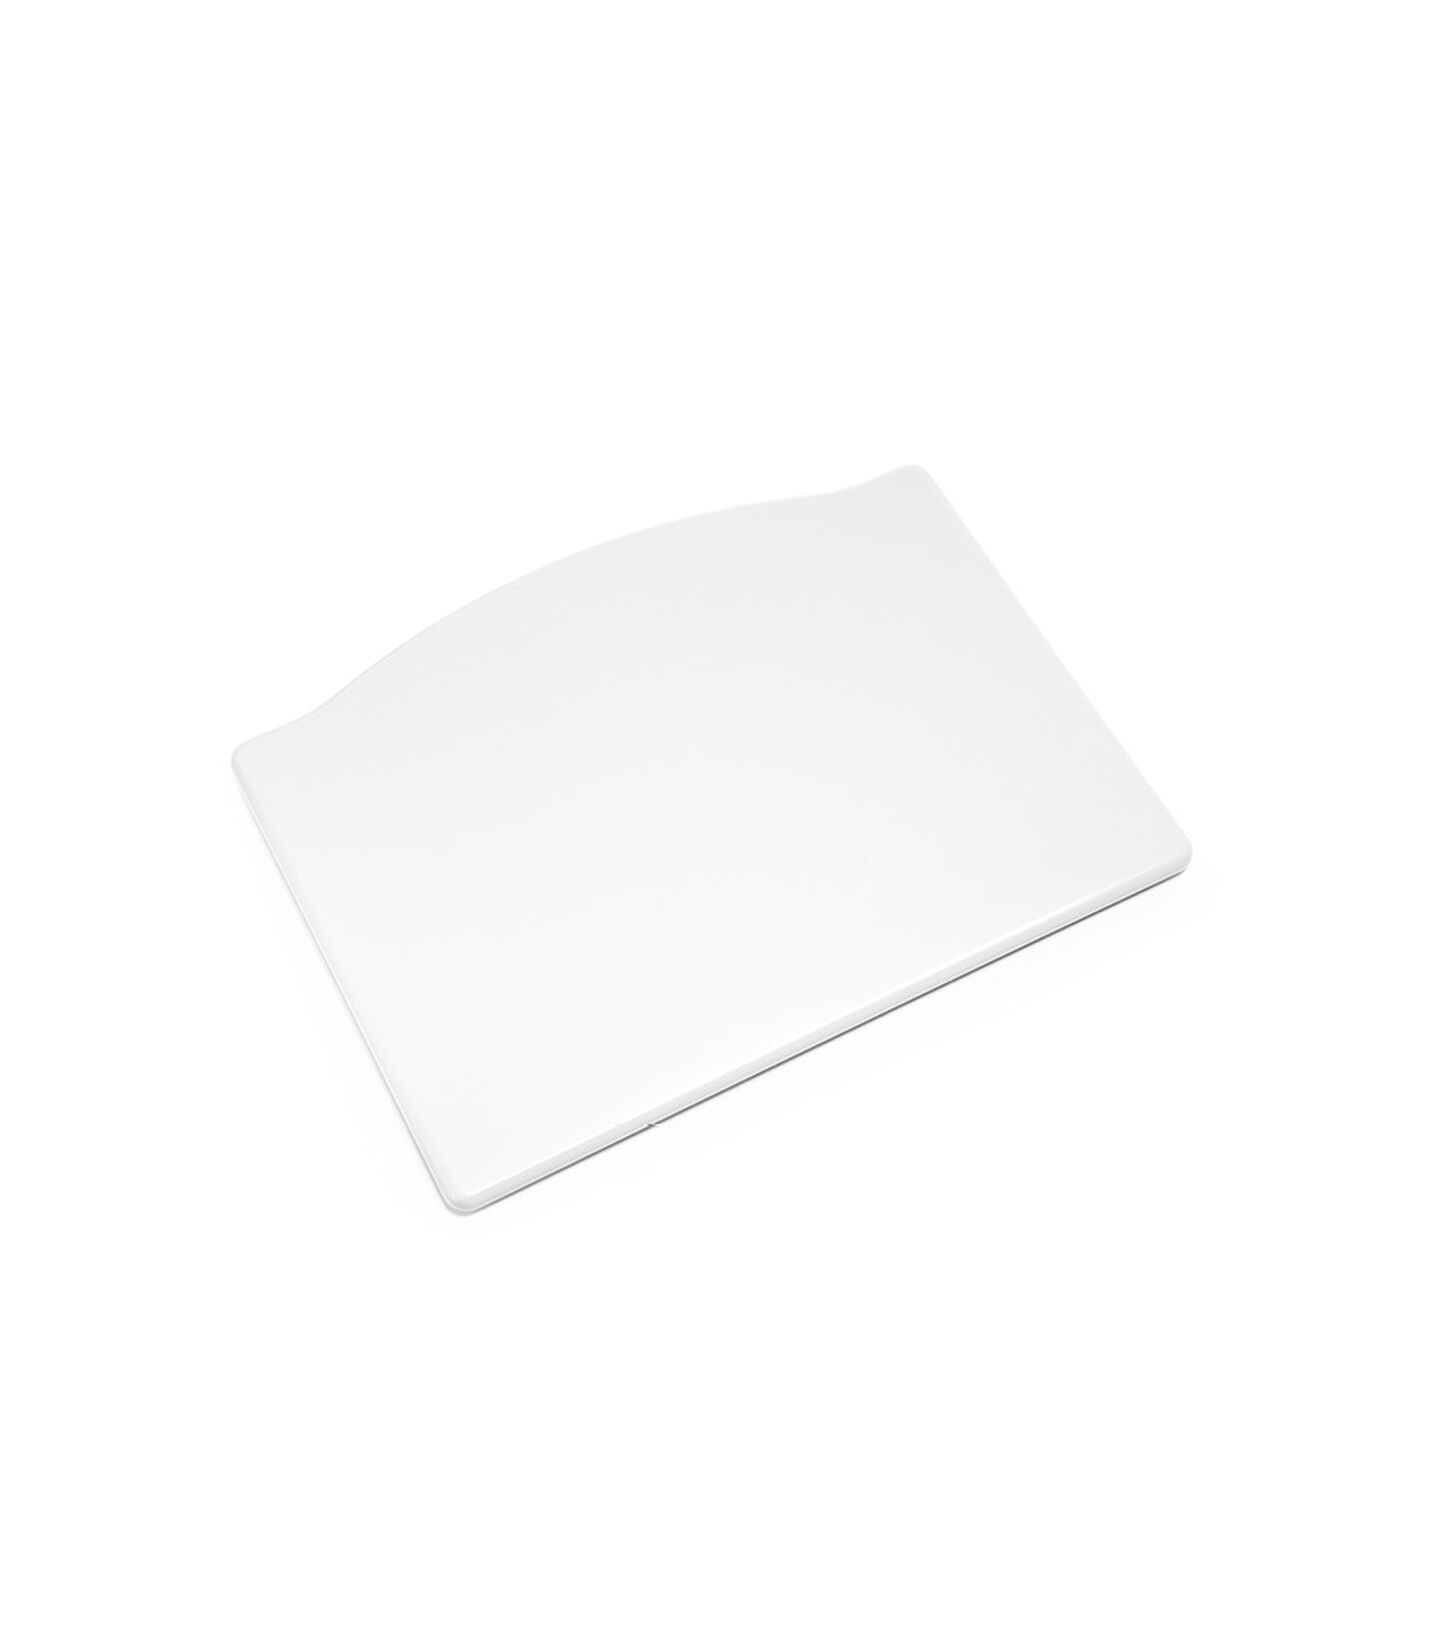 Tripp Trapp® Footplate White, White, mainview view 1